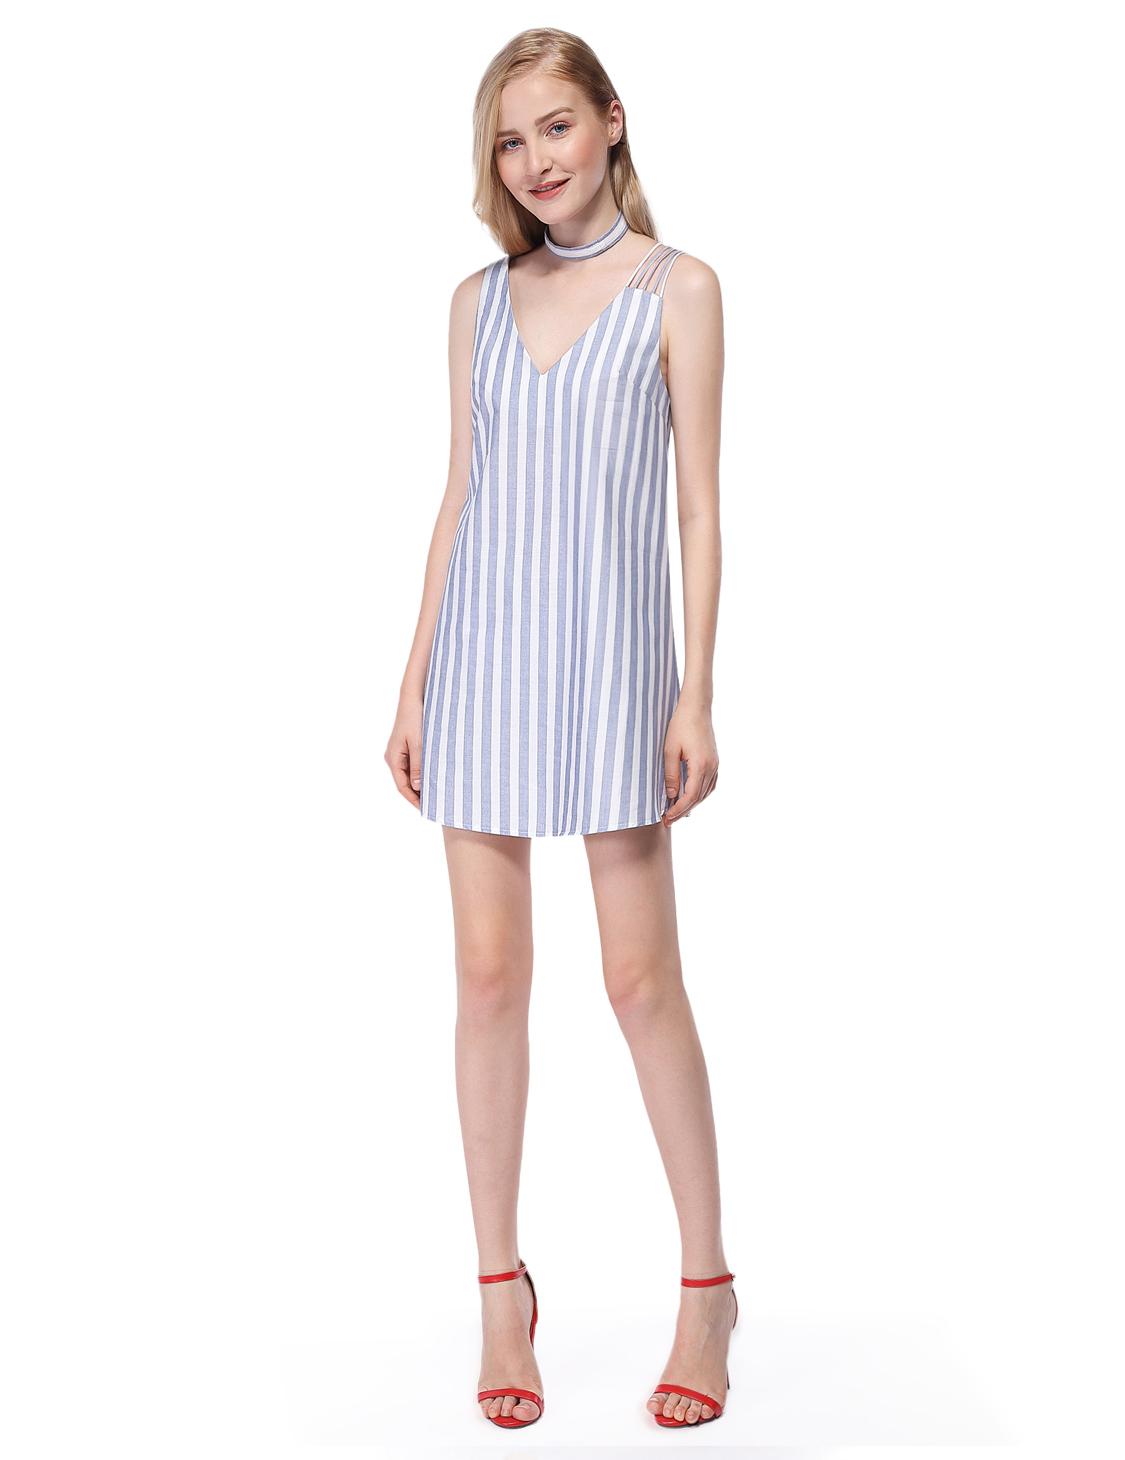 cafd13fff2550 Alisa Pan Summer V-Neck Sleeveless Striped Dress White Cotton ...